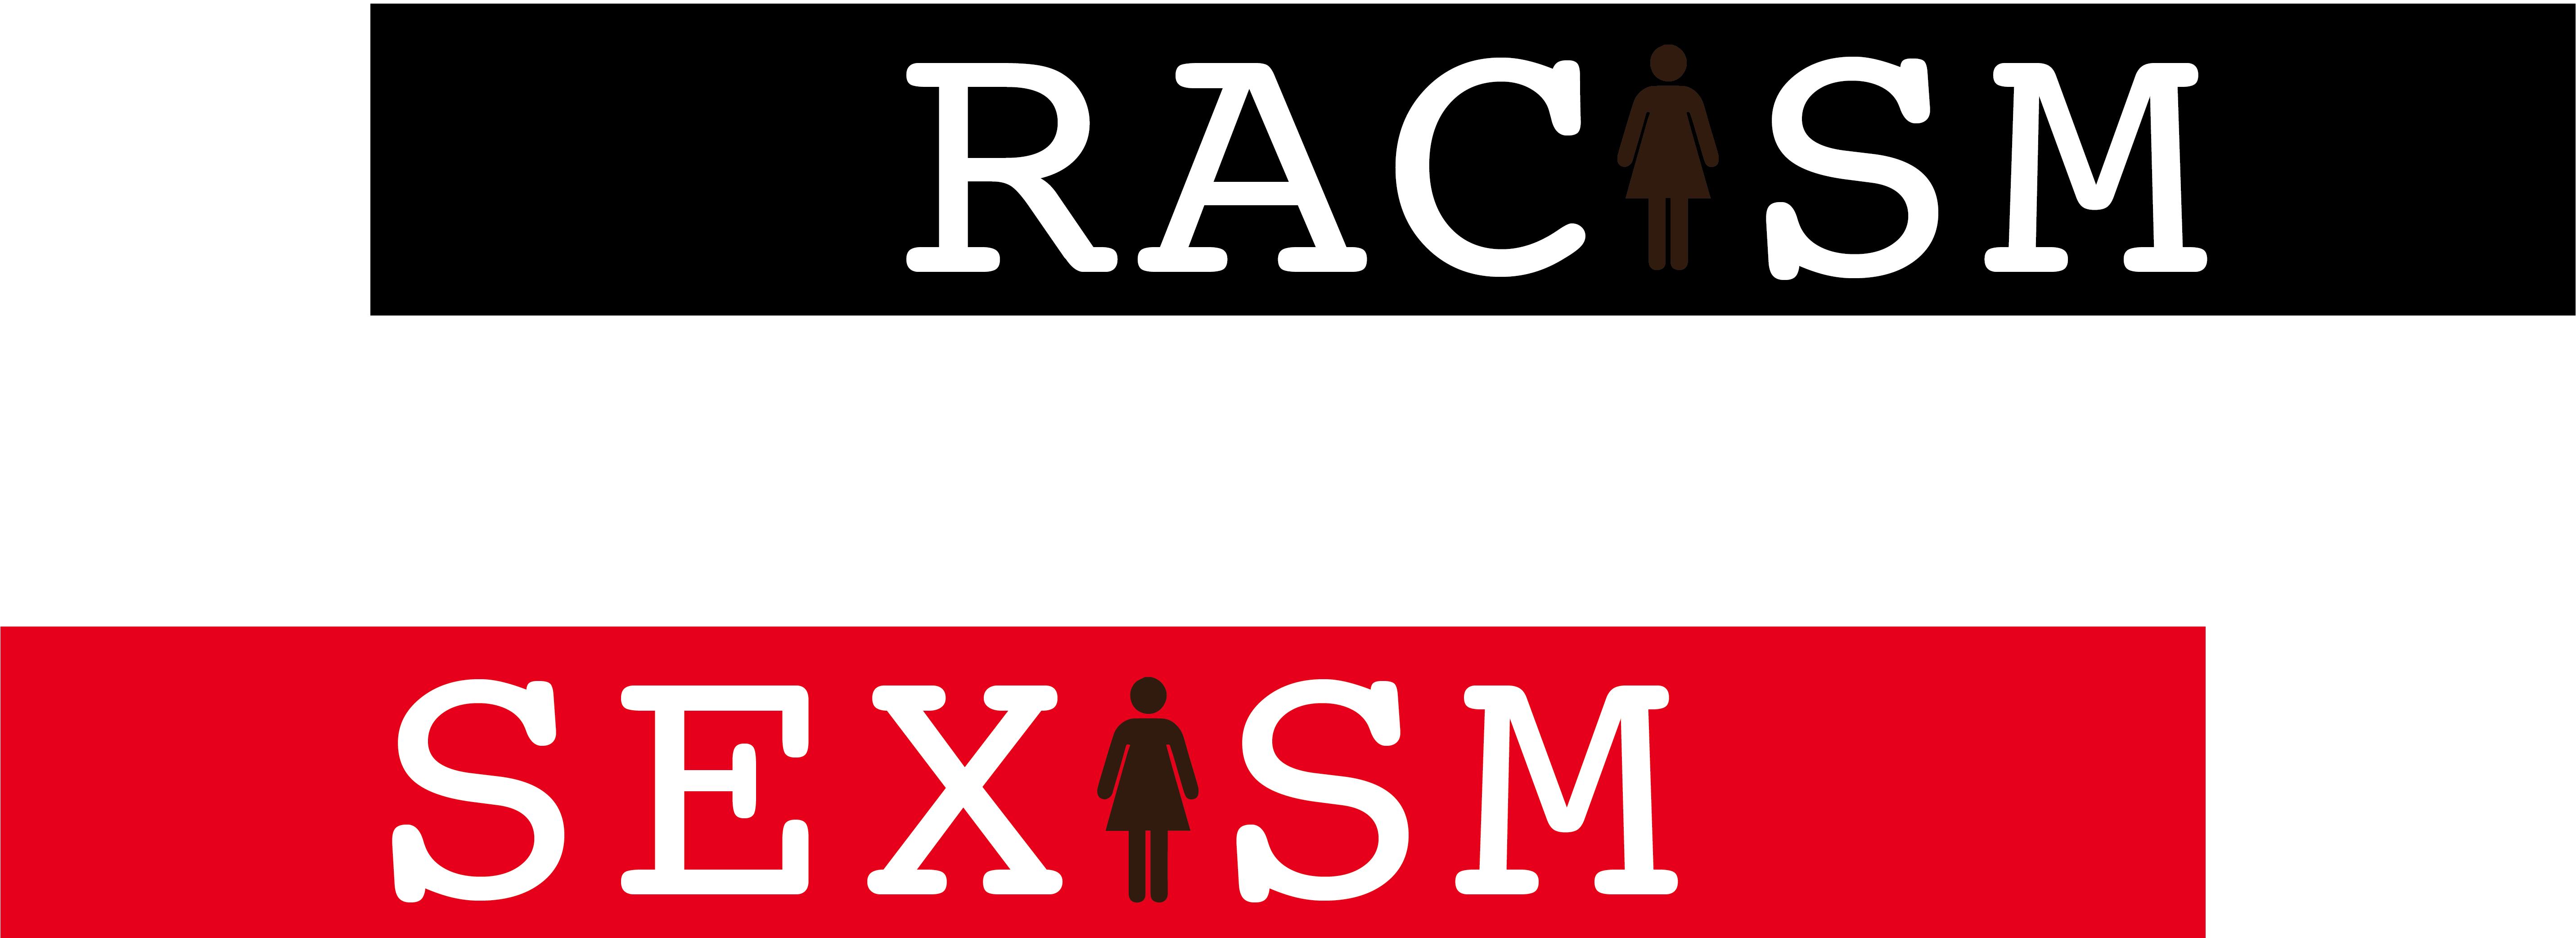 intersectionalgraphic-02